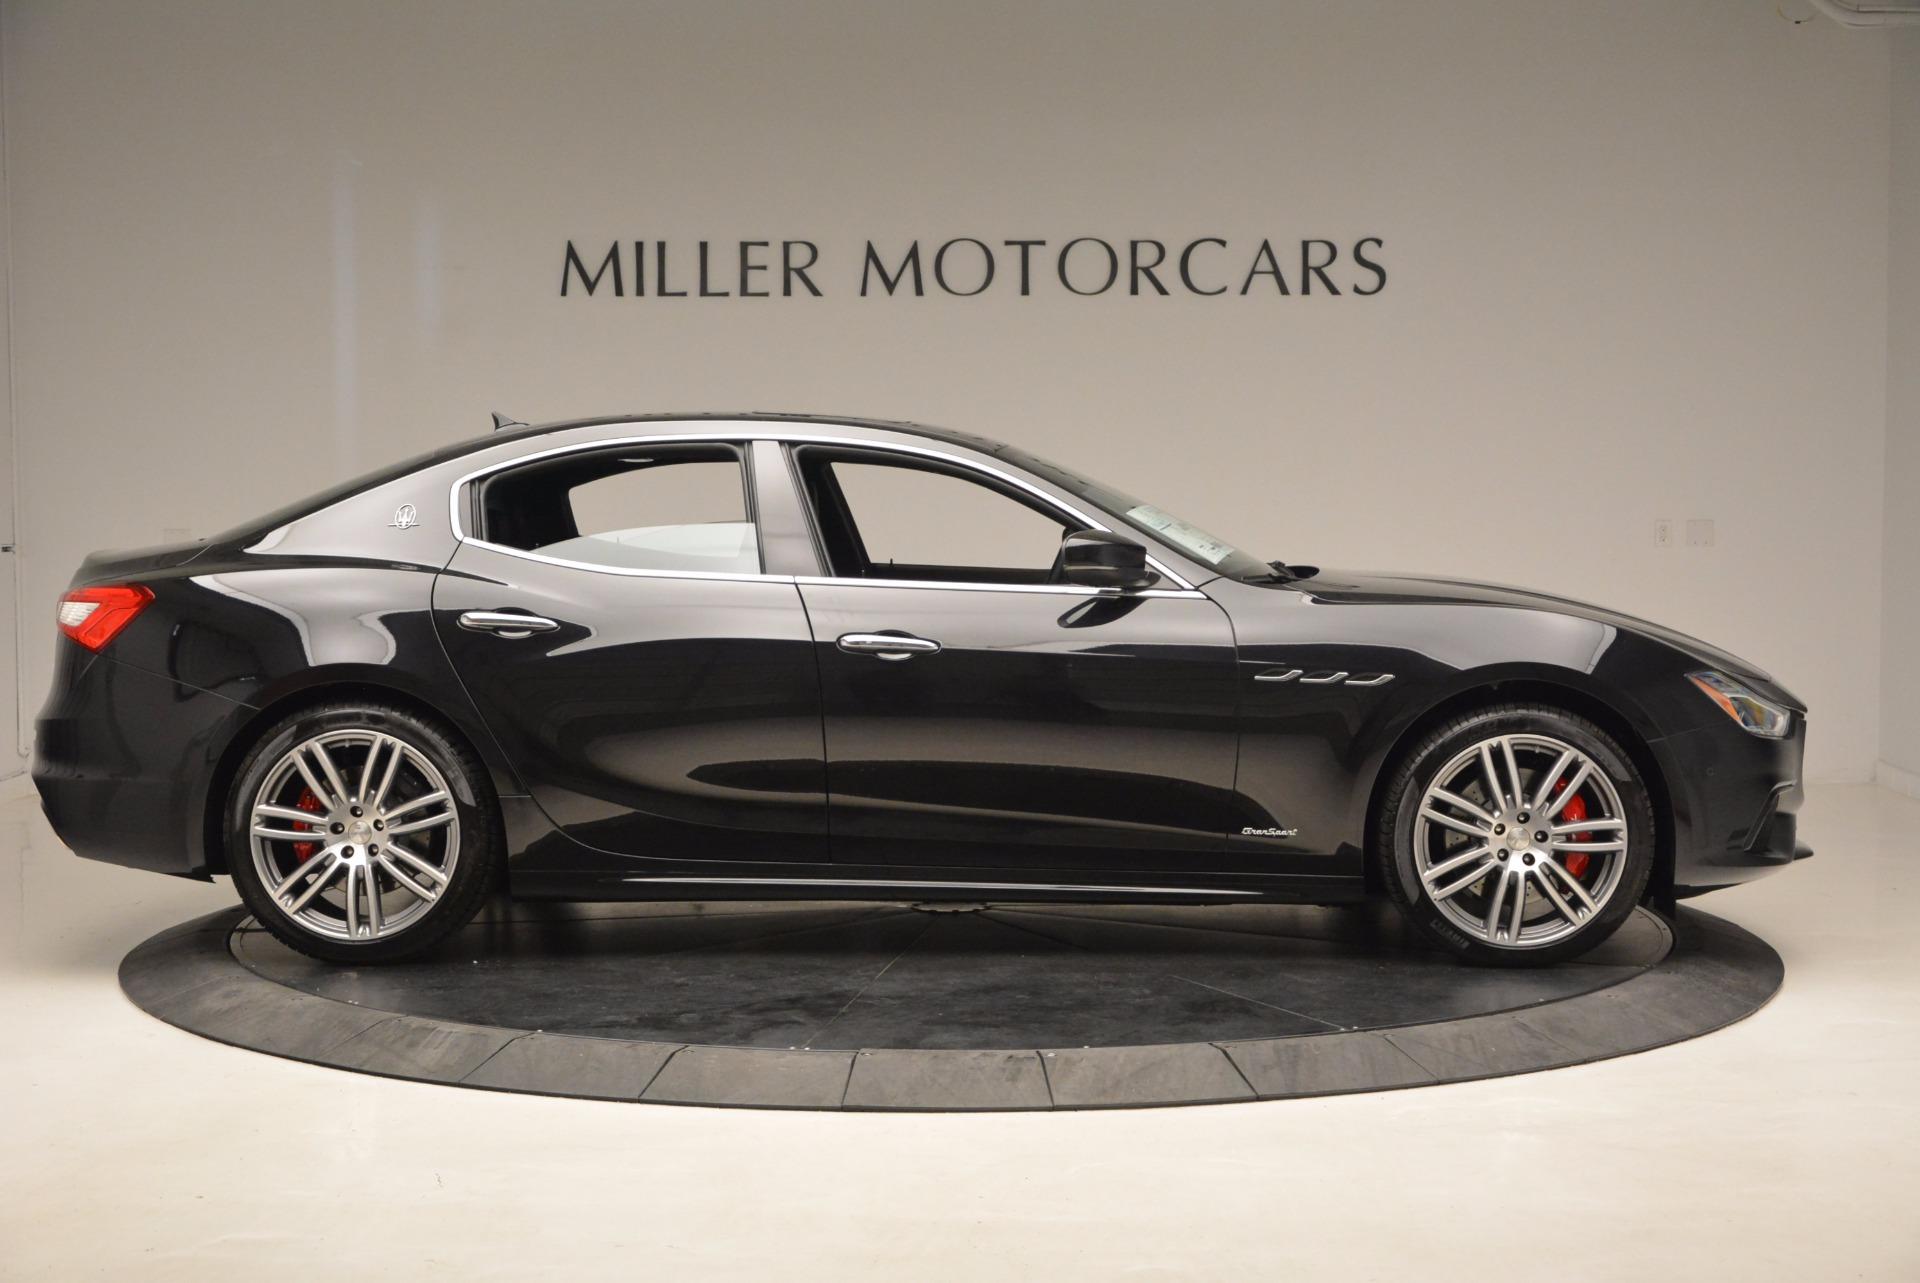 New 2018 Maserati Ghibli S Q4 Gransport For Sale In Greenwich, CT 1855_p9